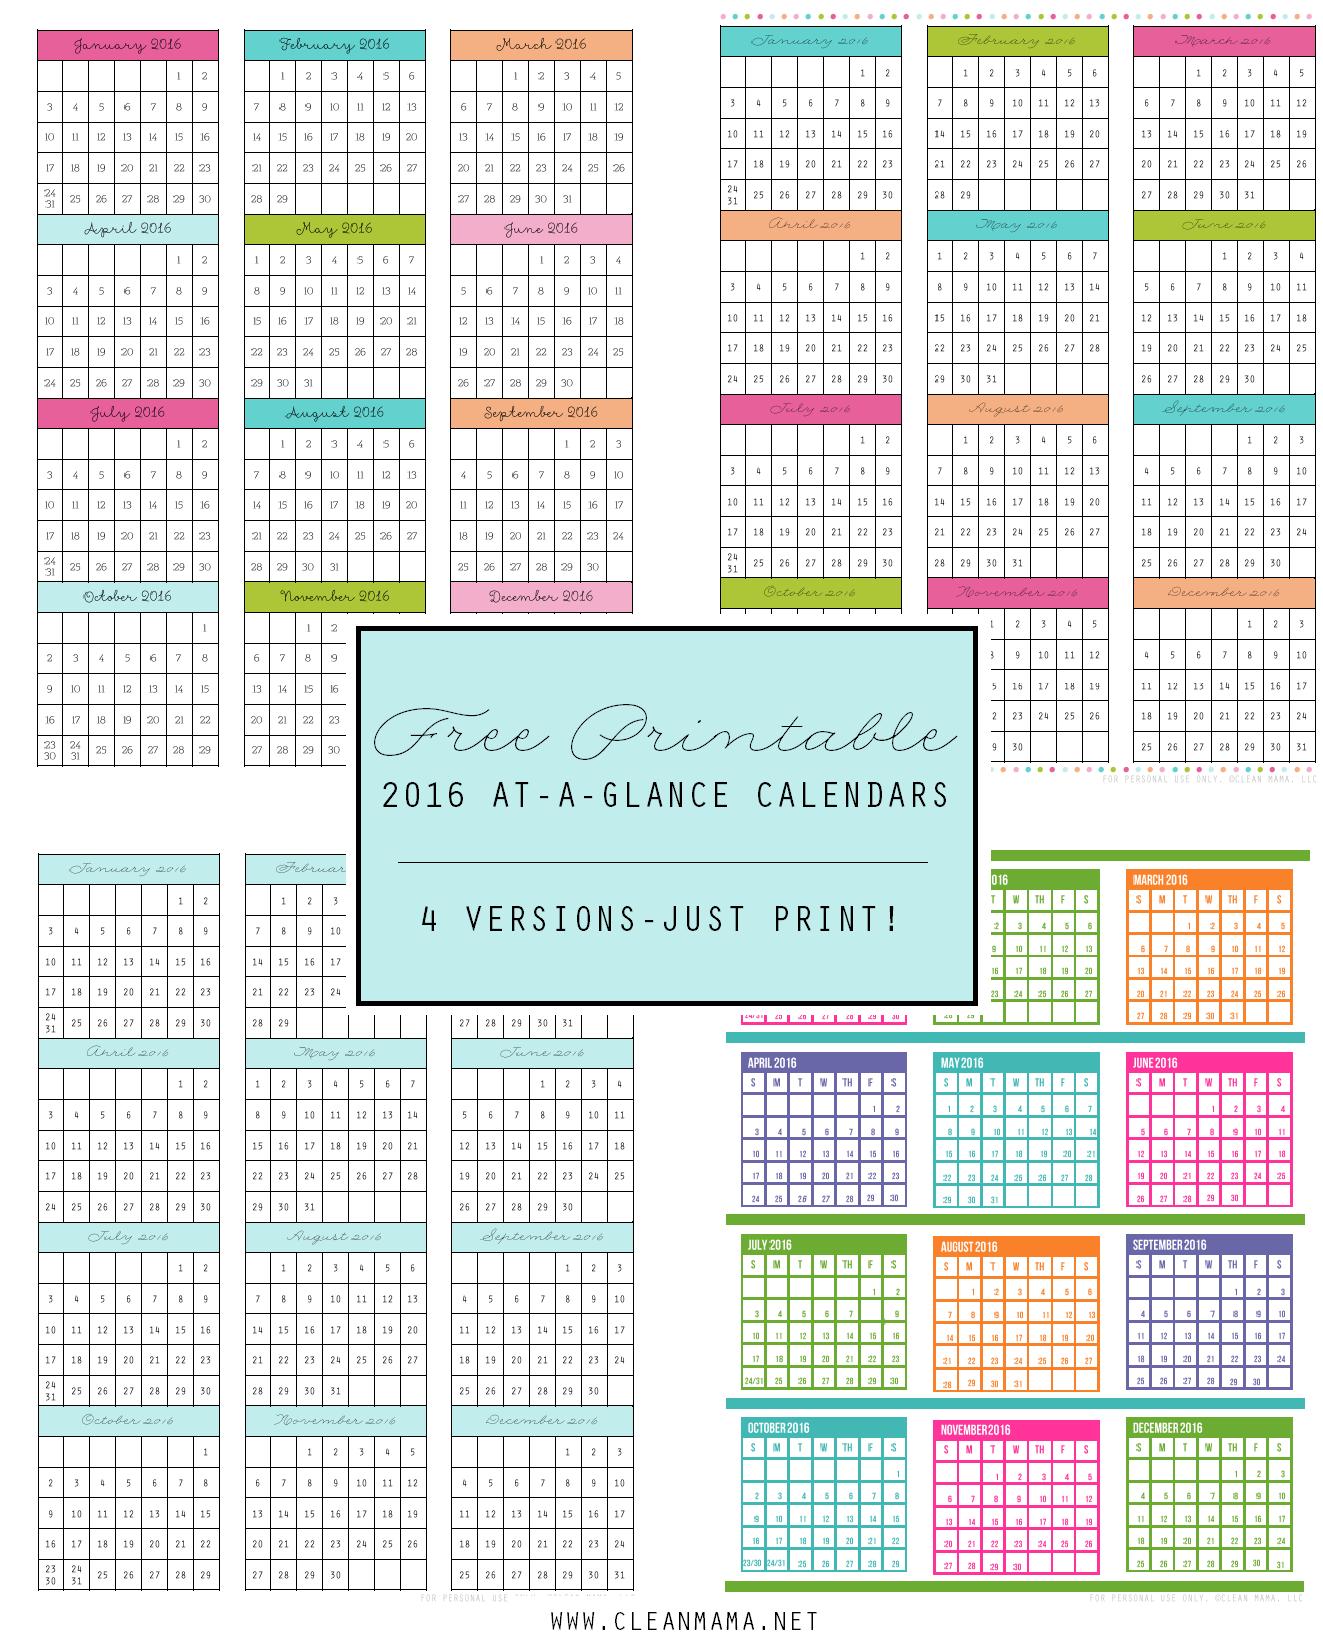 FREE 2016 At-A-Glance Calendars